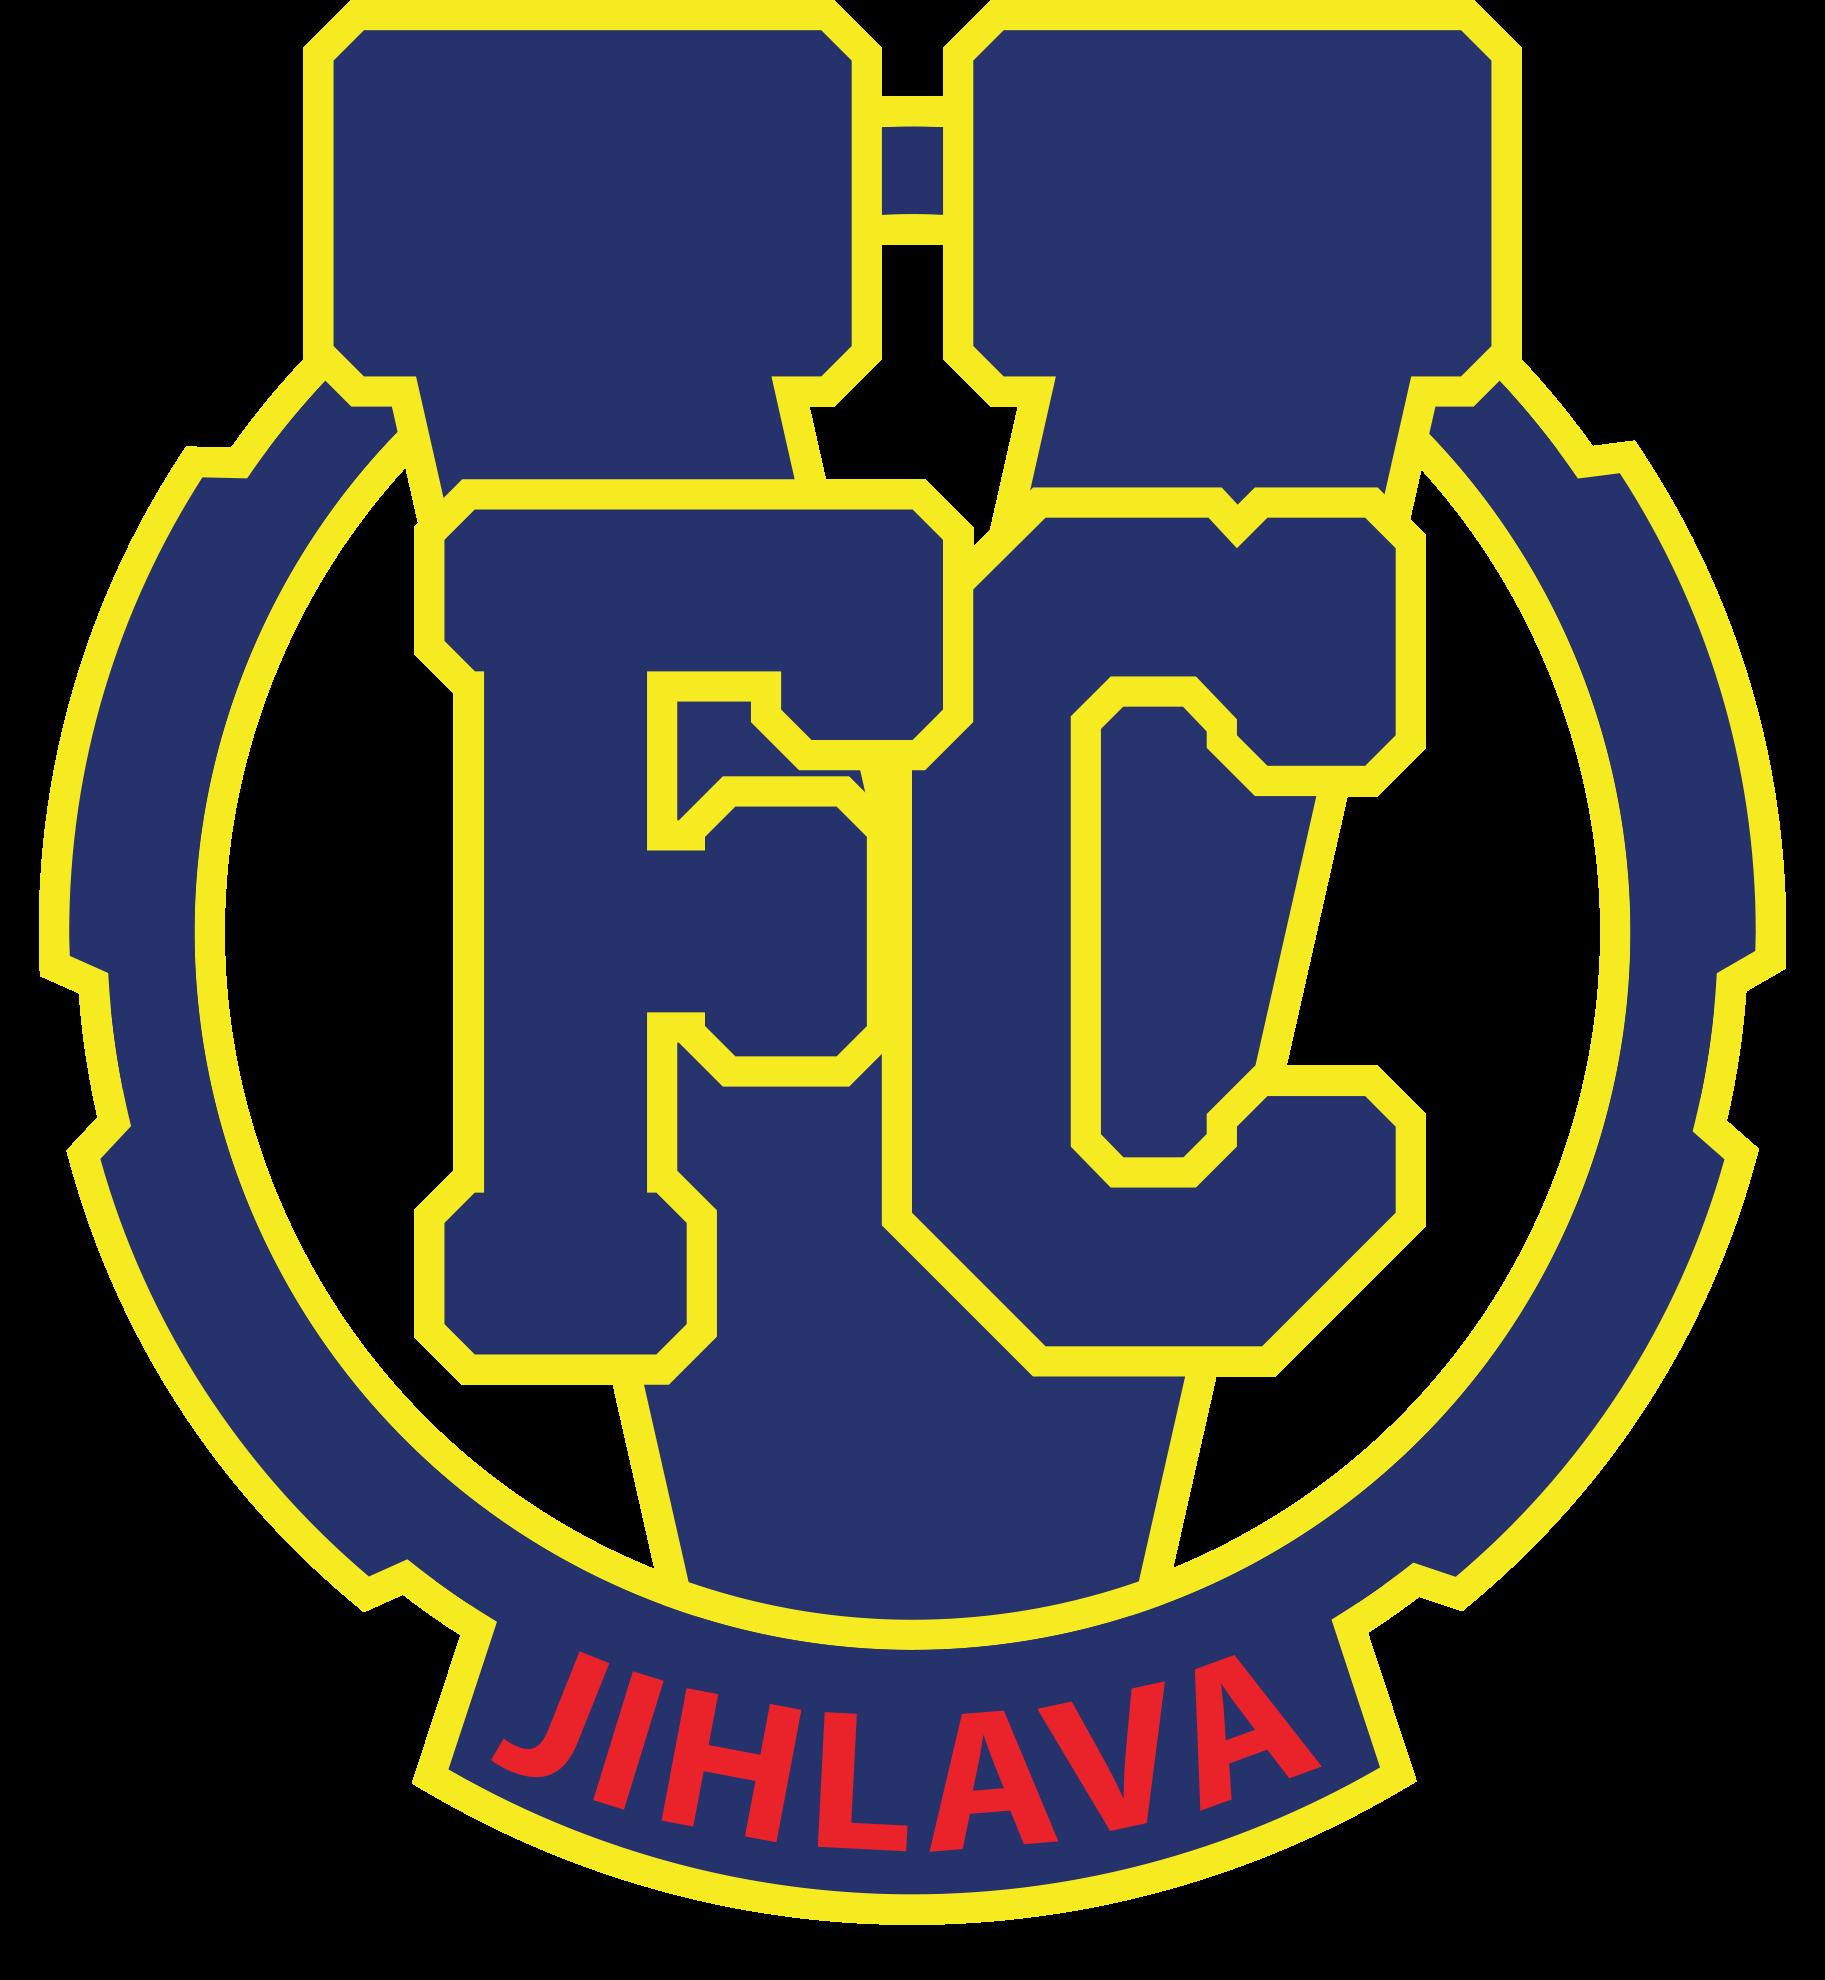 Jihlava-2 logo